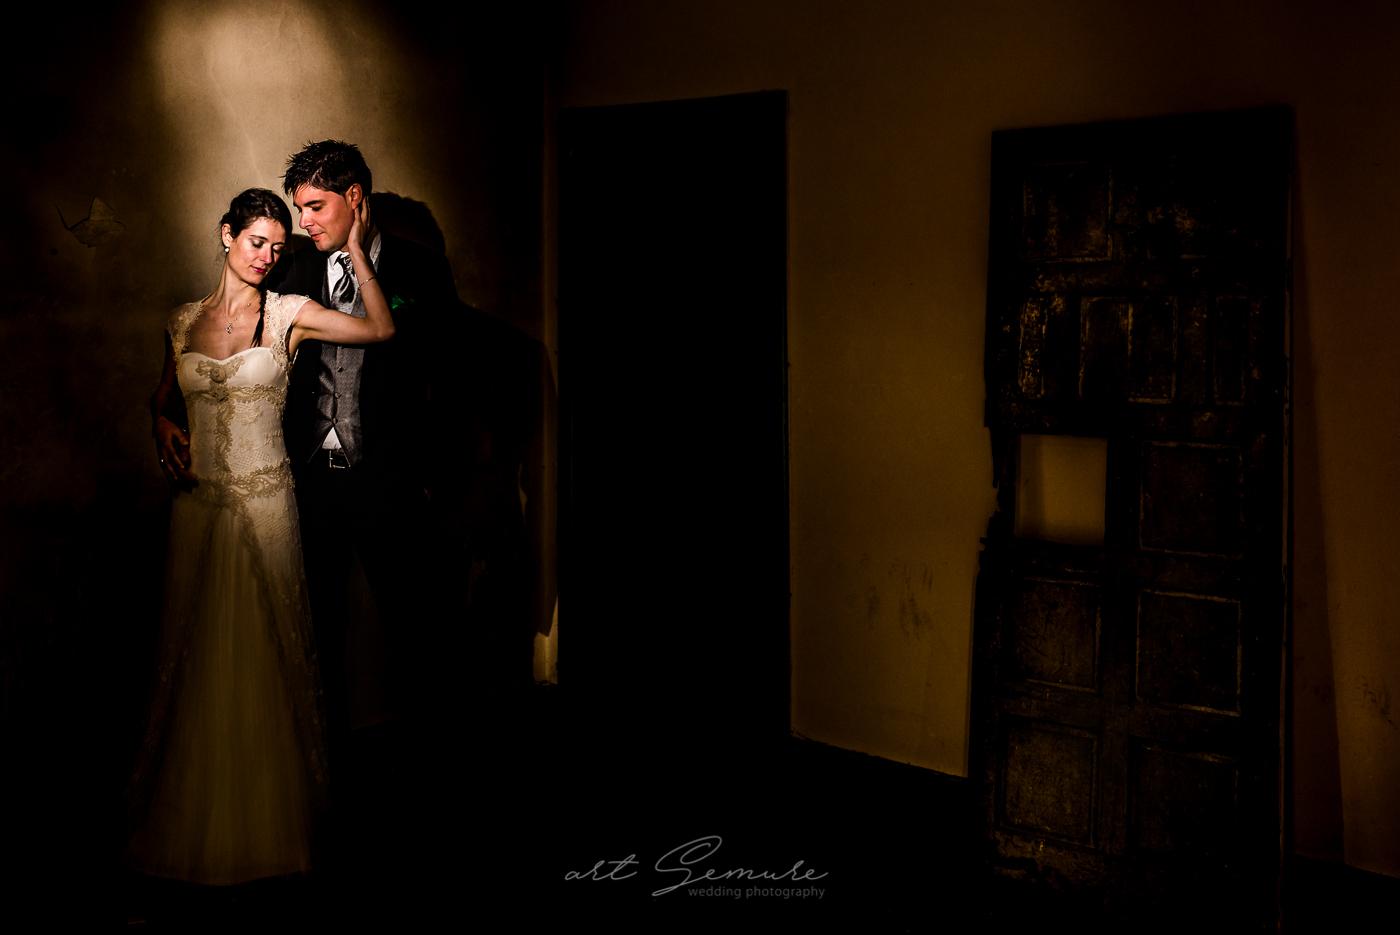 fotografo boda emotiva zamora salto de castro 12_